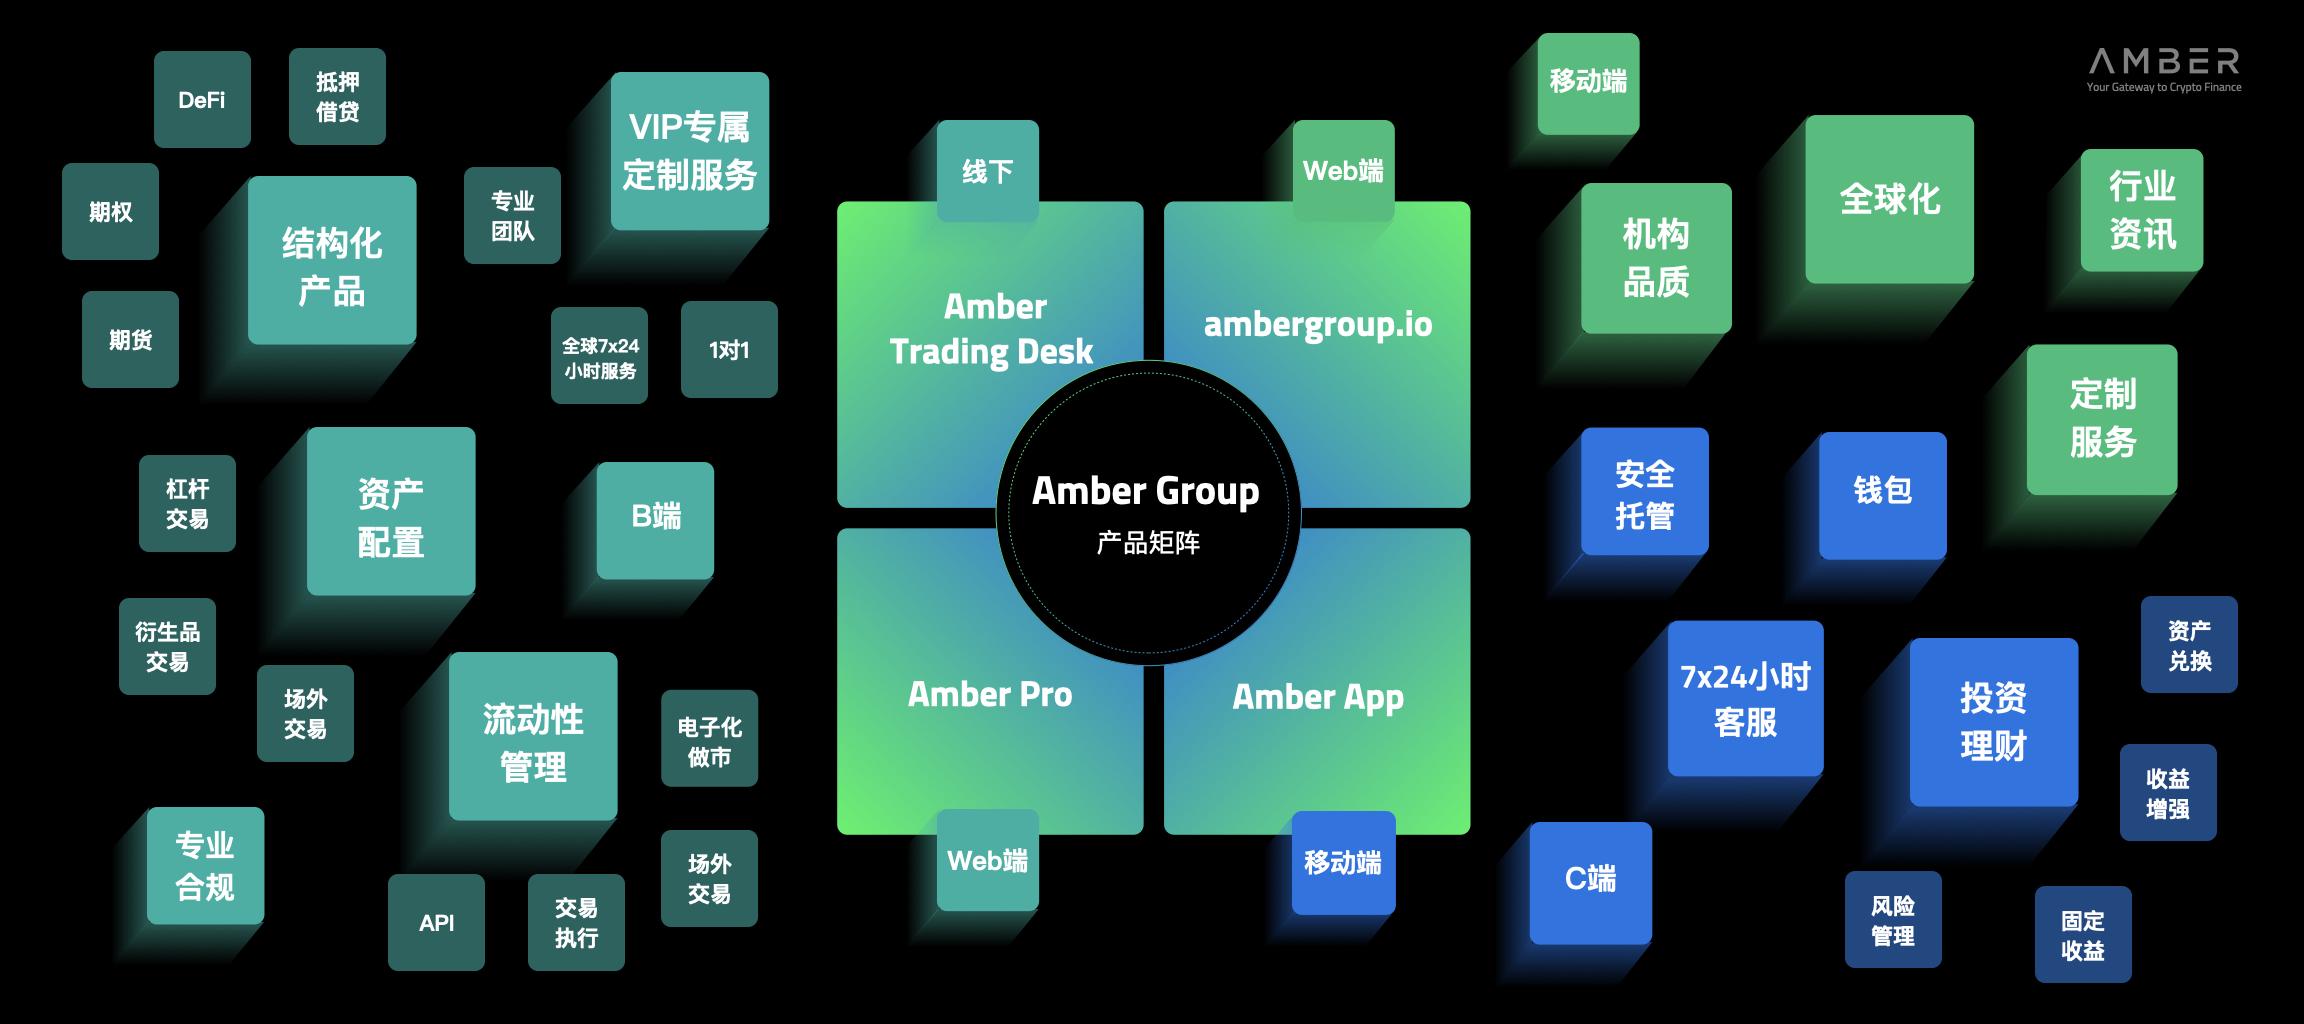 Amber Group产品矩阵全新发布 全链条产品引领行业未来